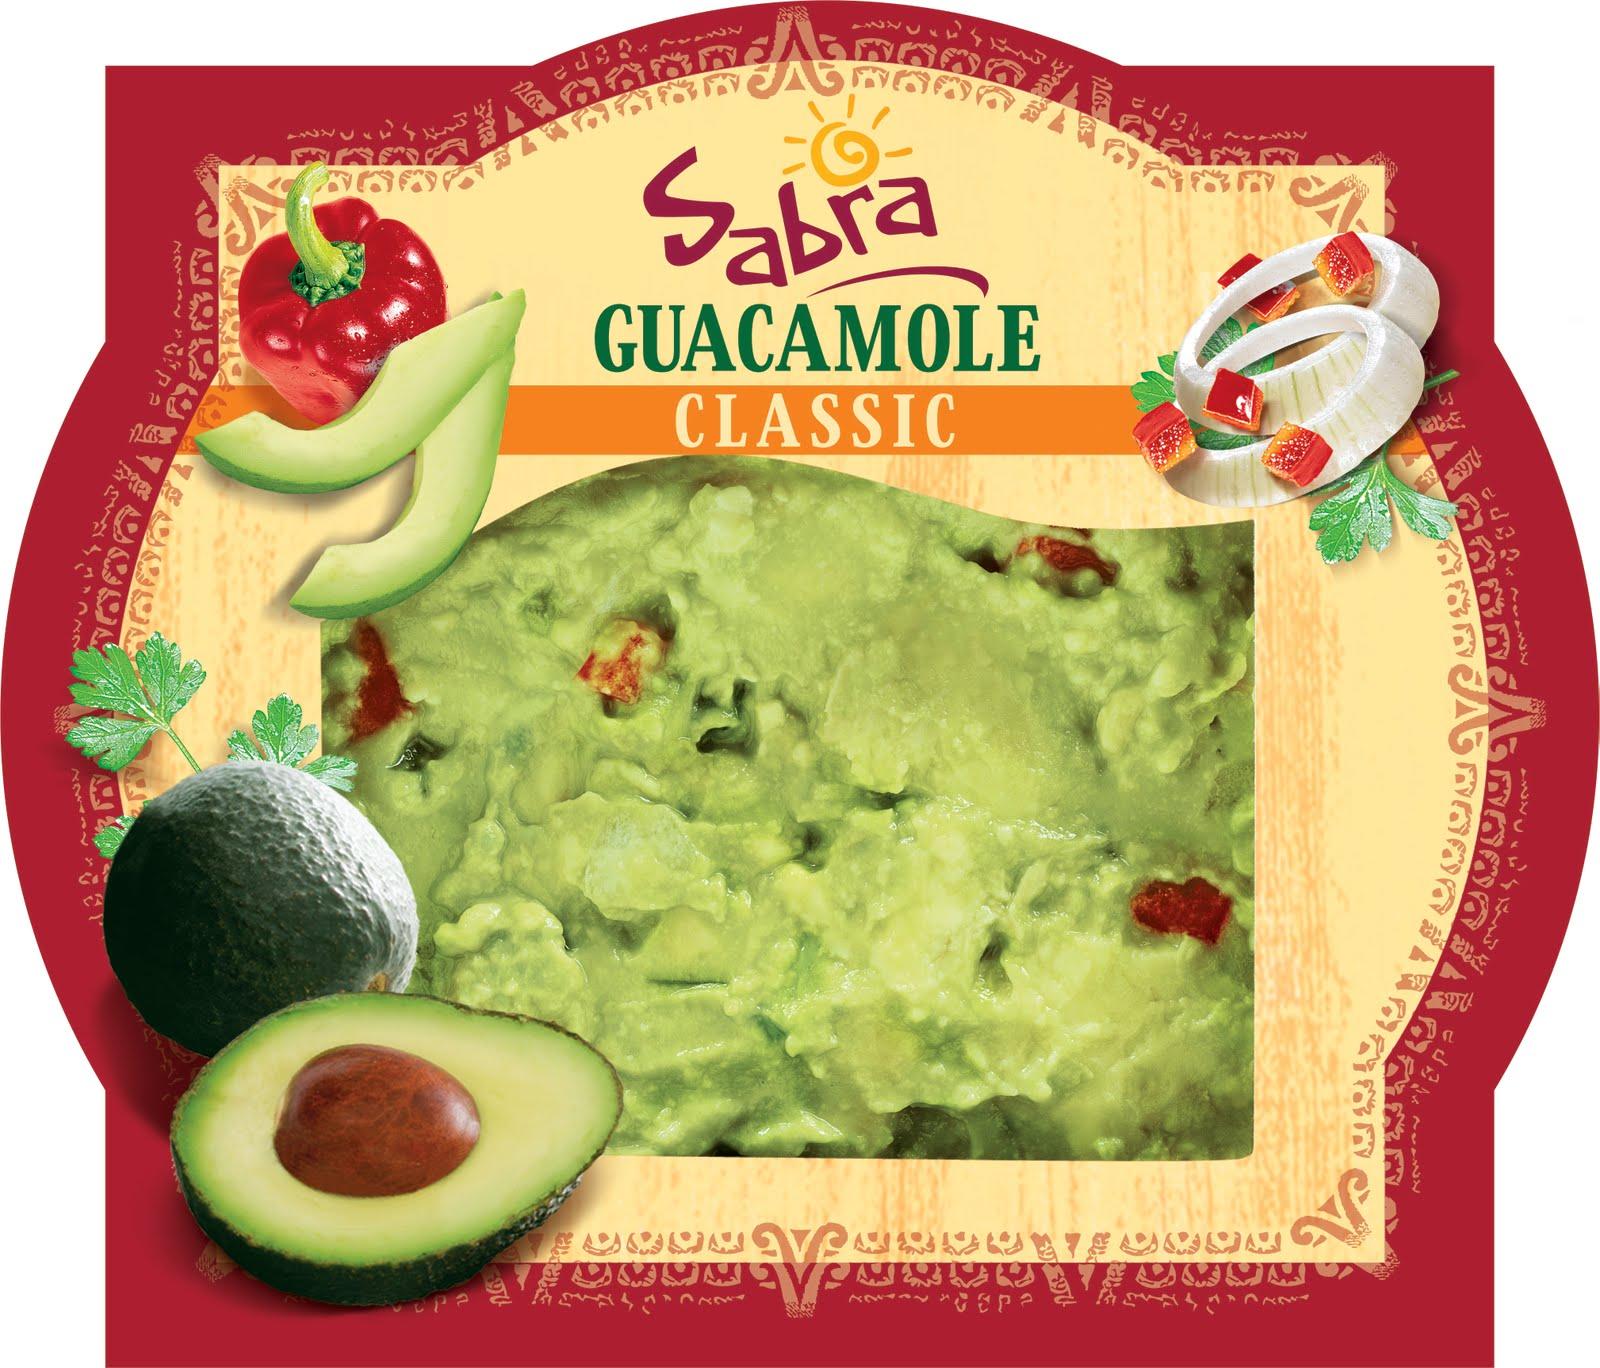 Sabra+Classic+Guacamole.jpg